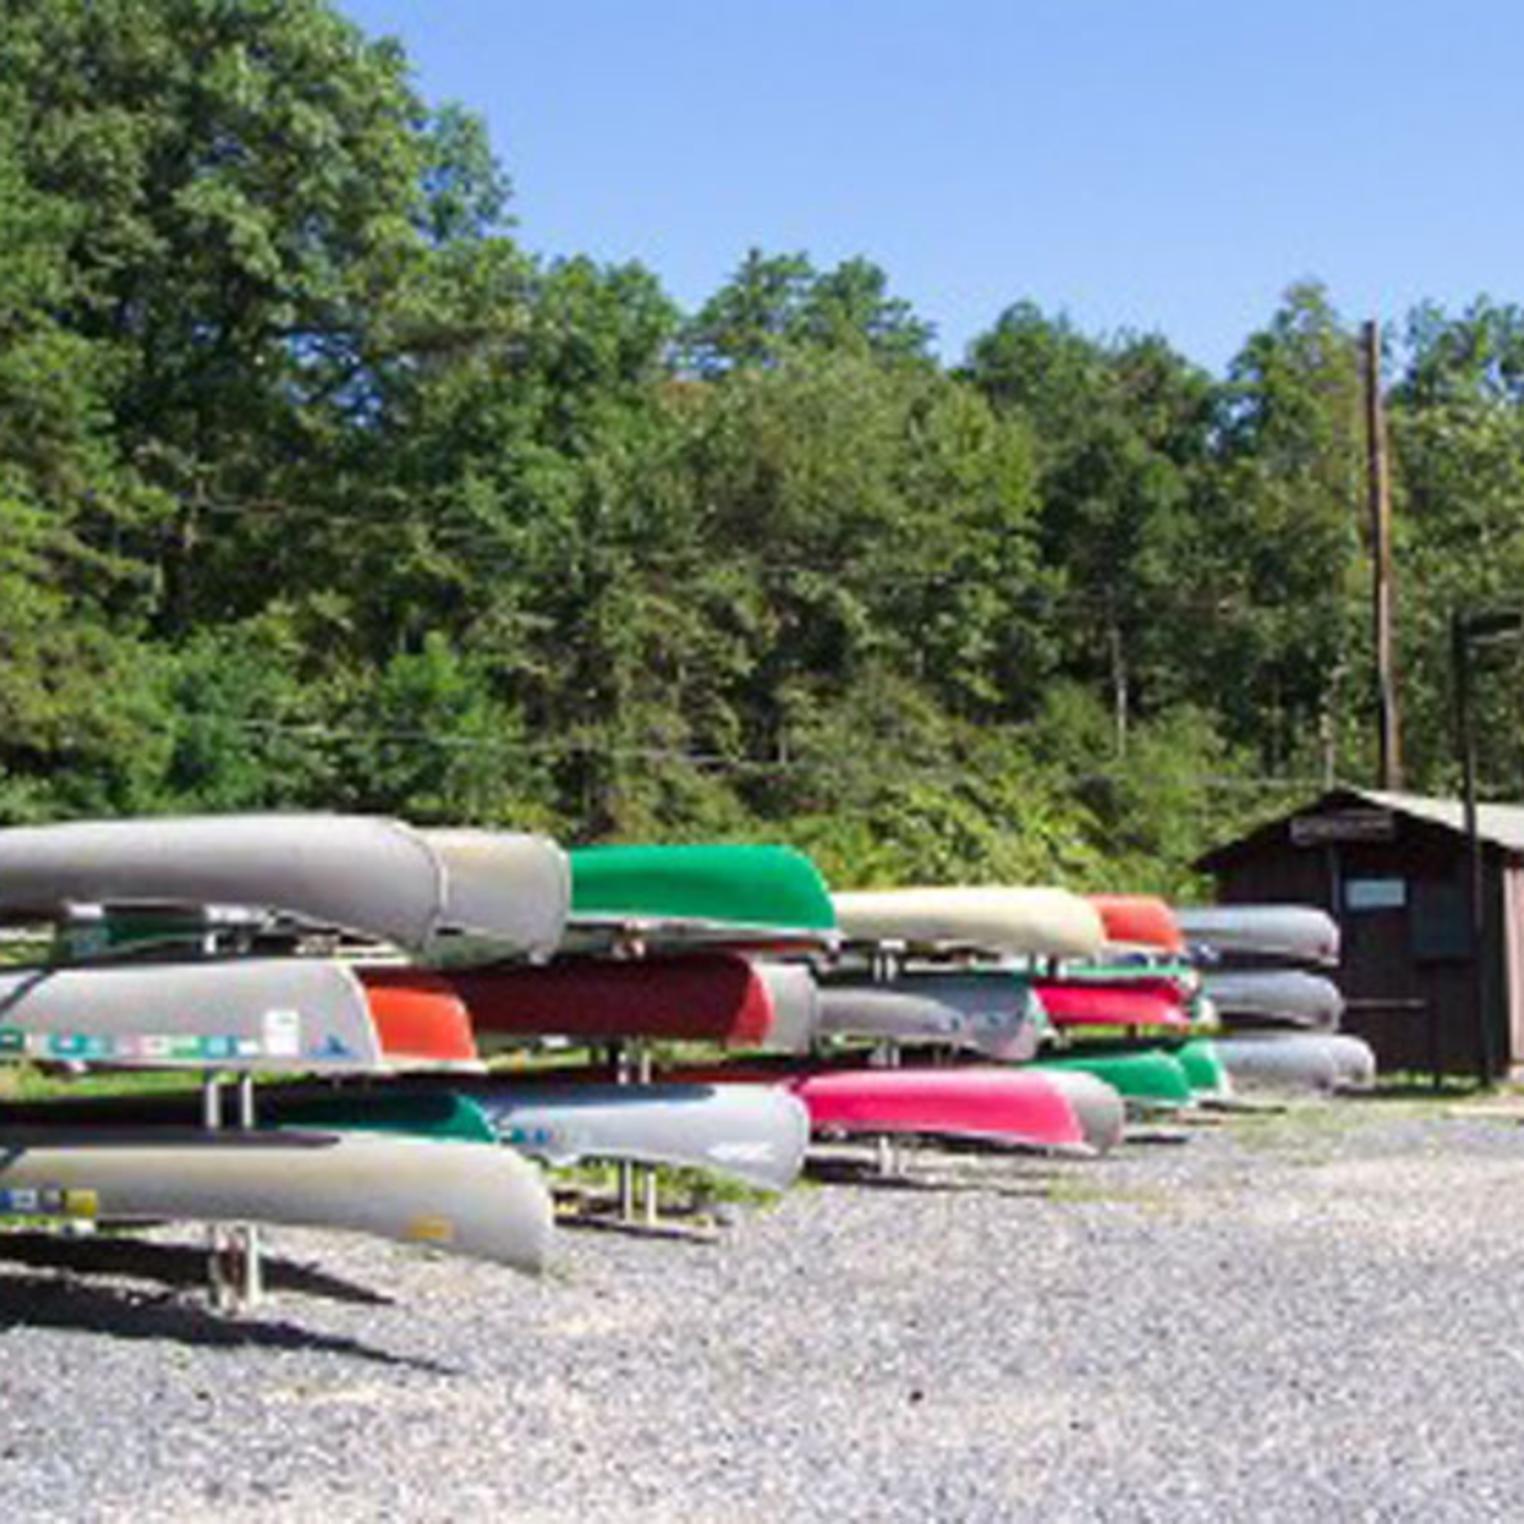 Kayak Rentals at Pine Grove Furnace State Park